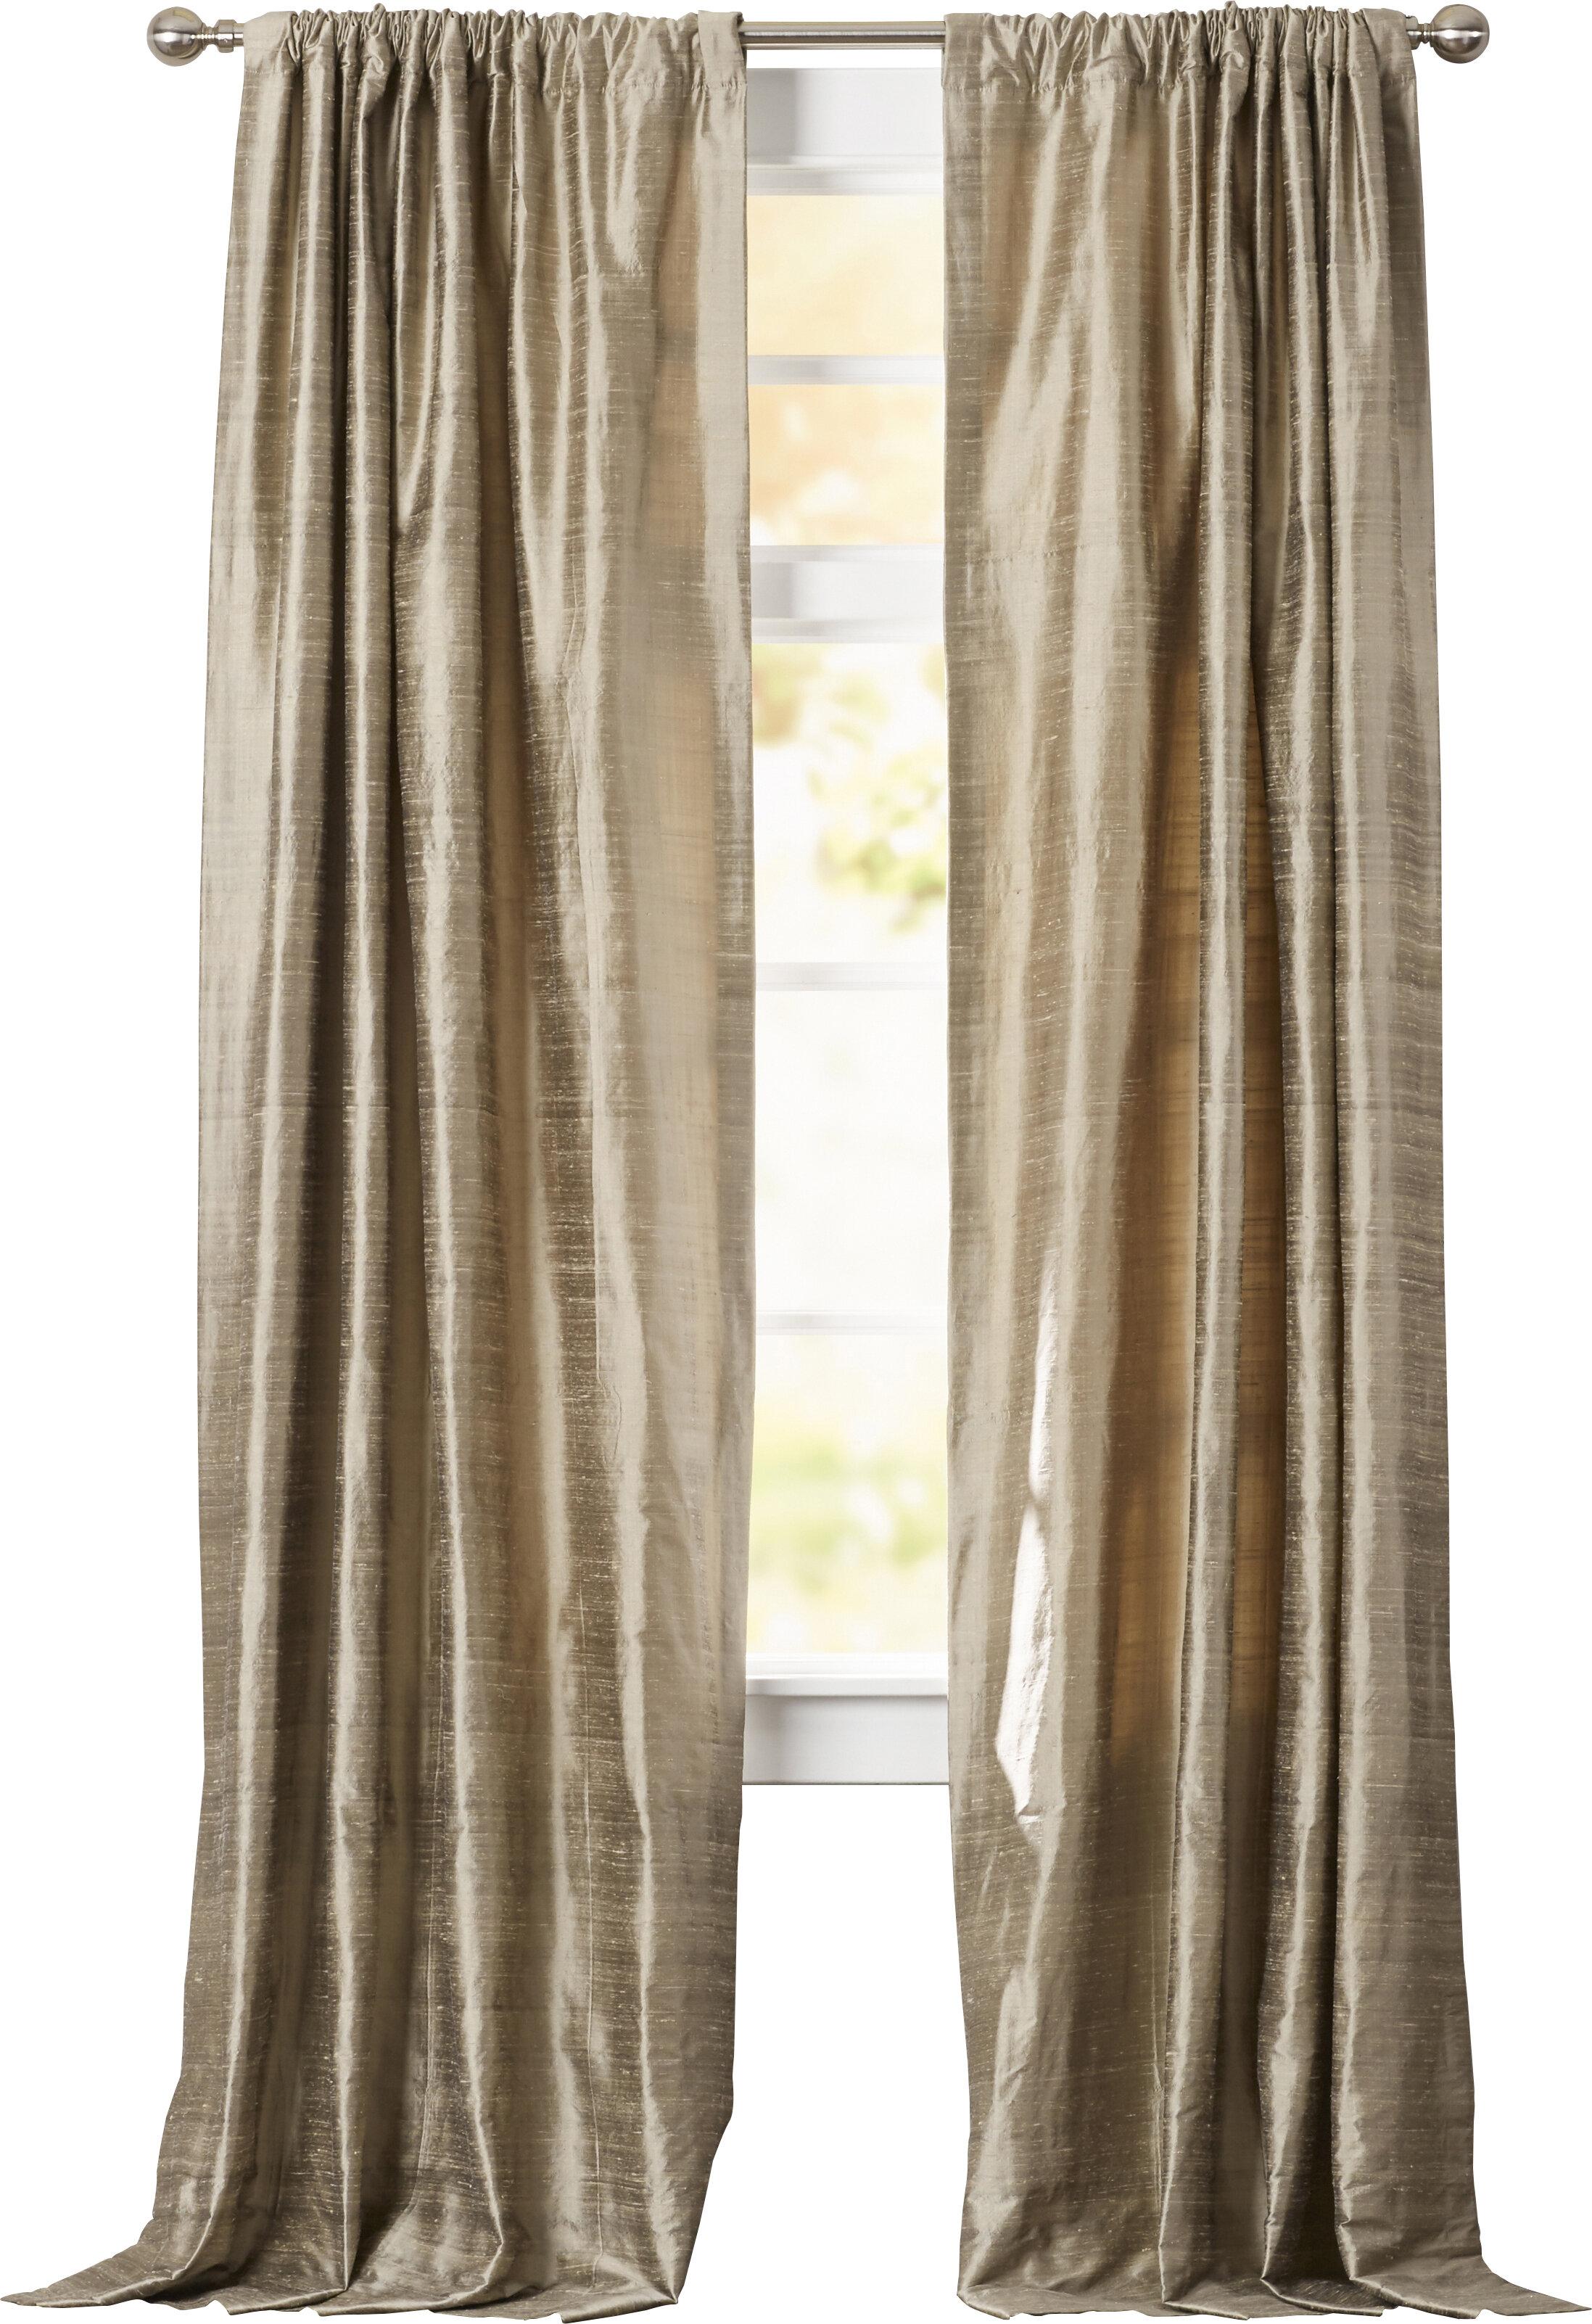 Silk Room Darkening Thermal Rod Pocket Single Curtain Panel Reviews Birch Lane